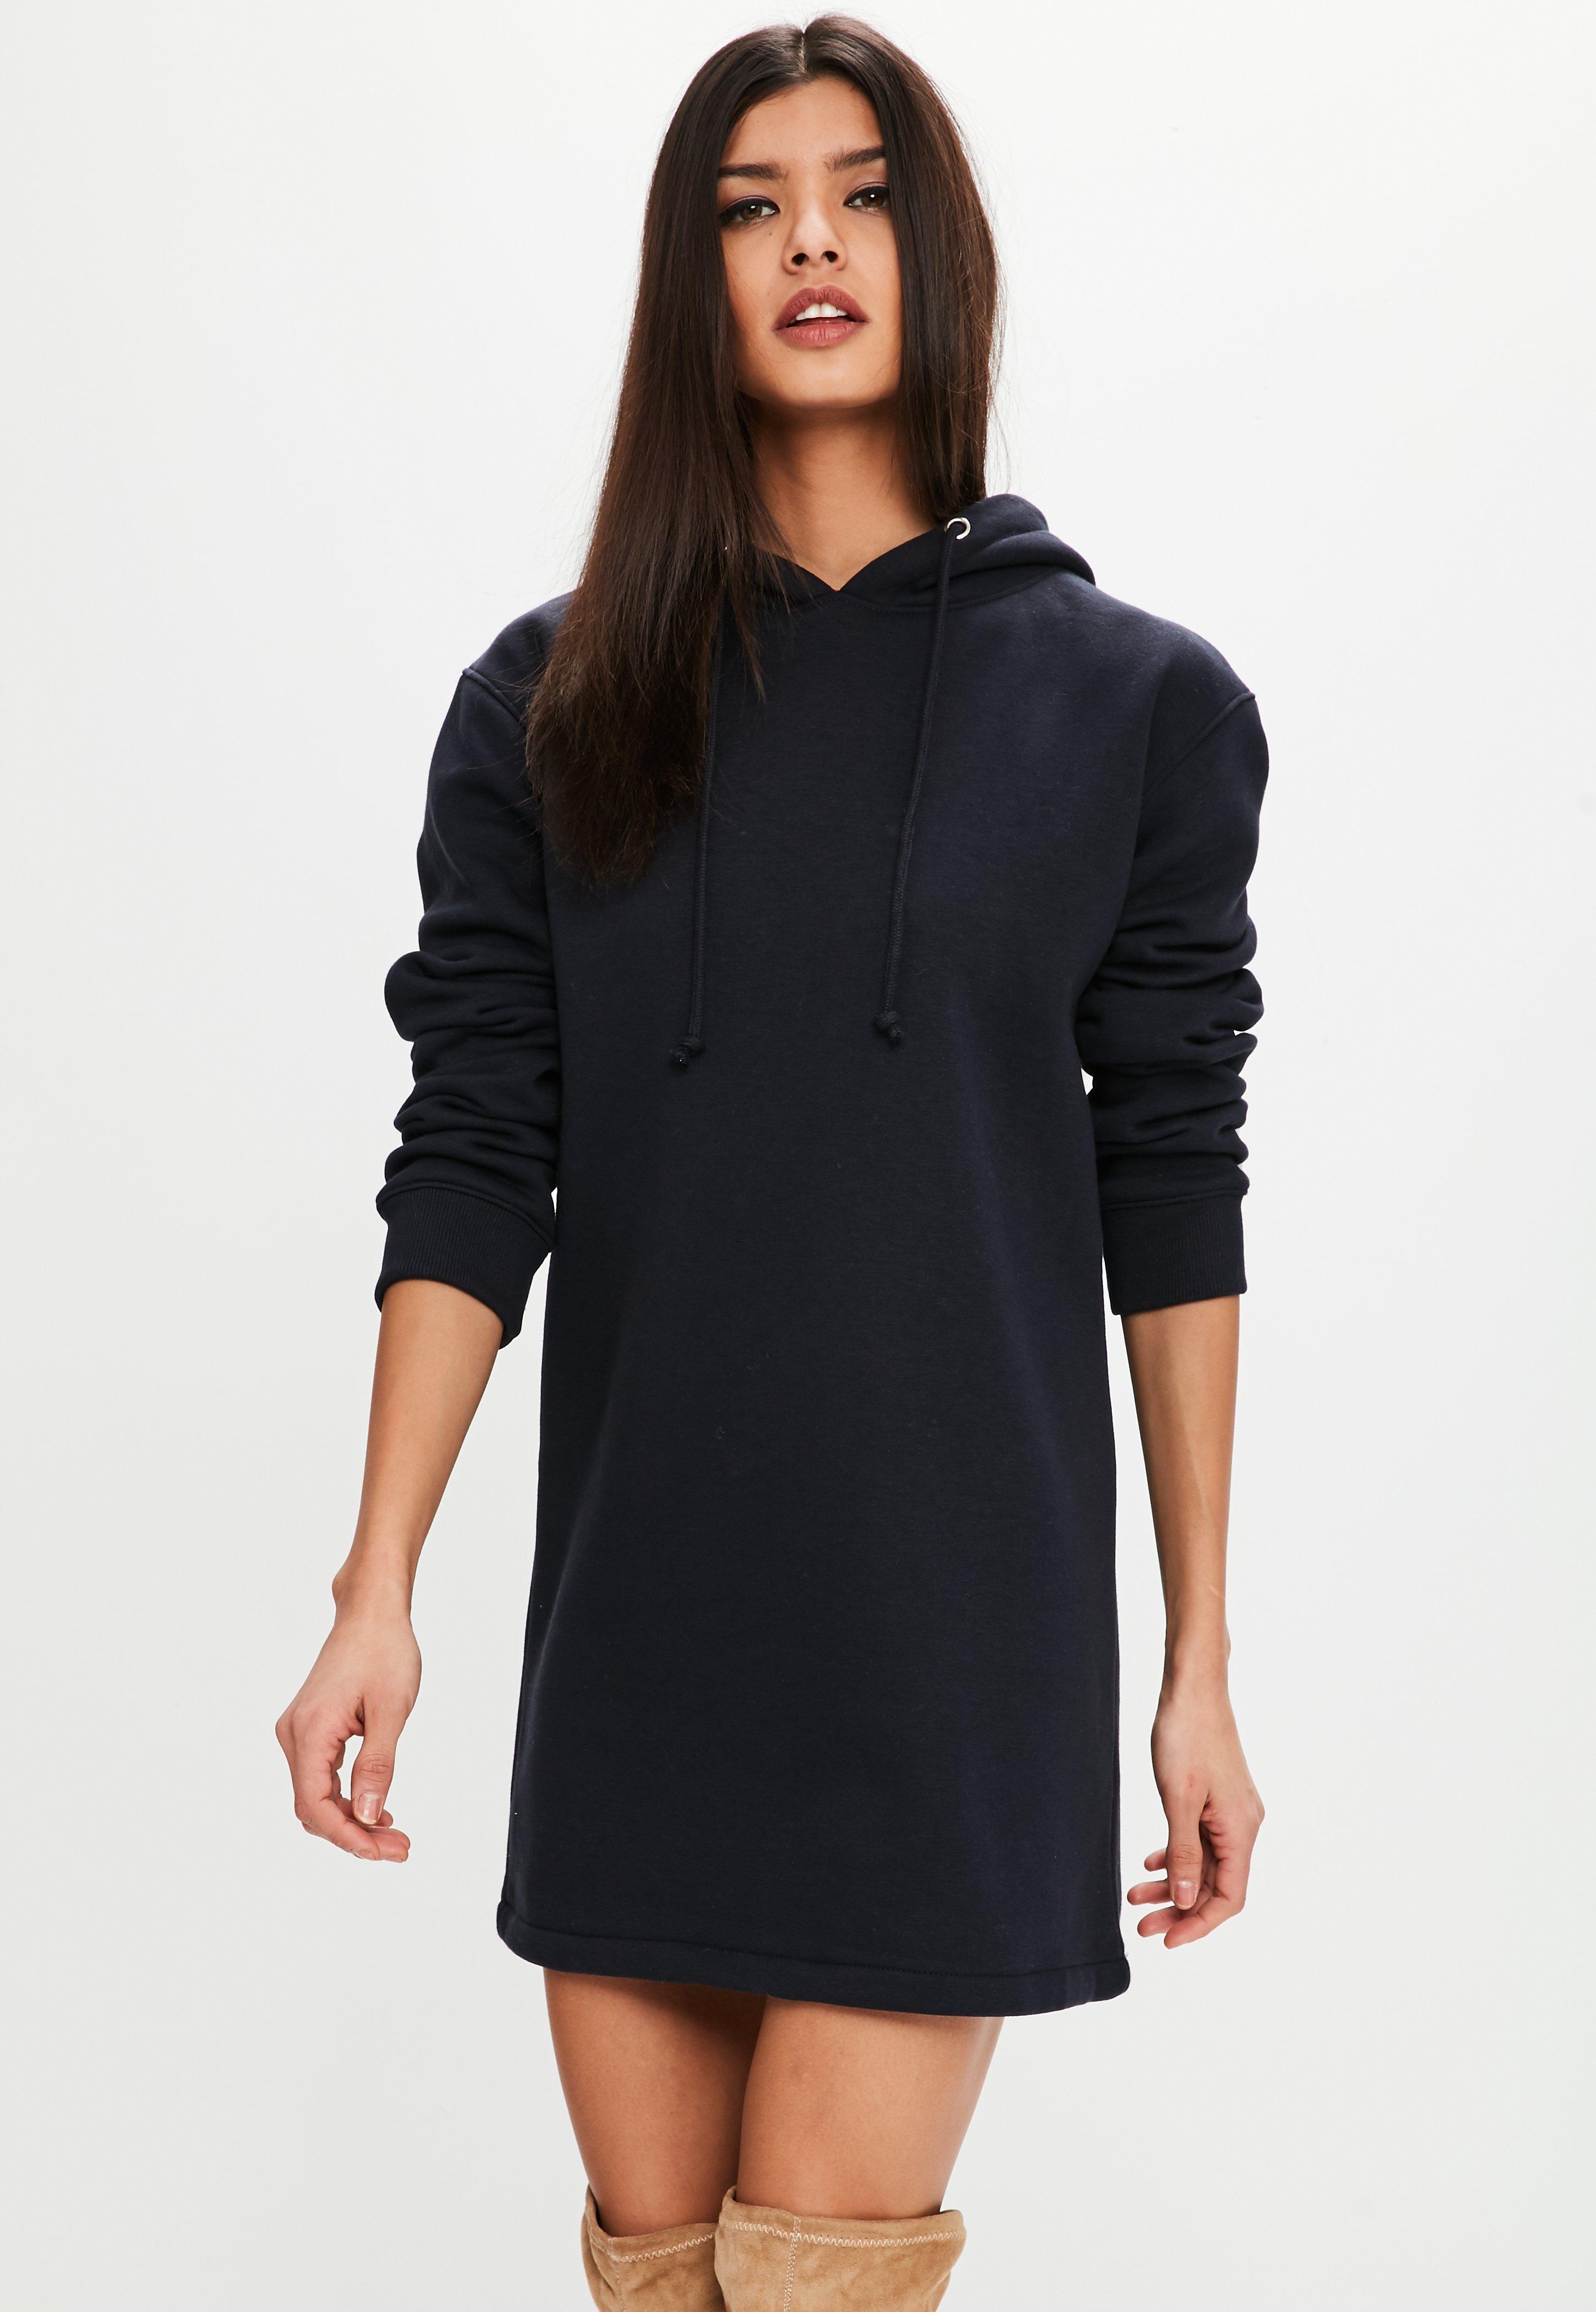 2d6bc1ba06 Navy Long Sleeve Hooded Sweater Dress